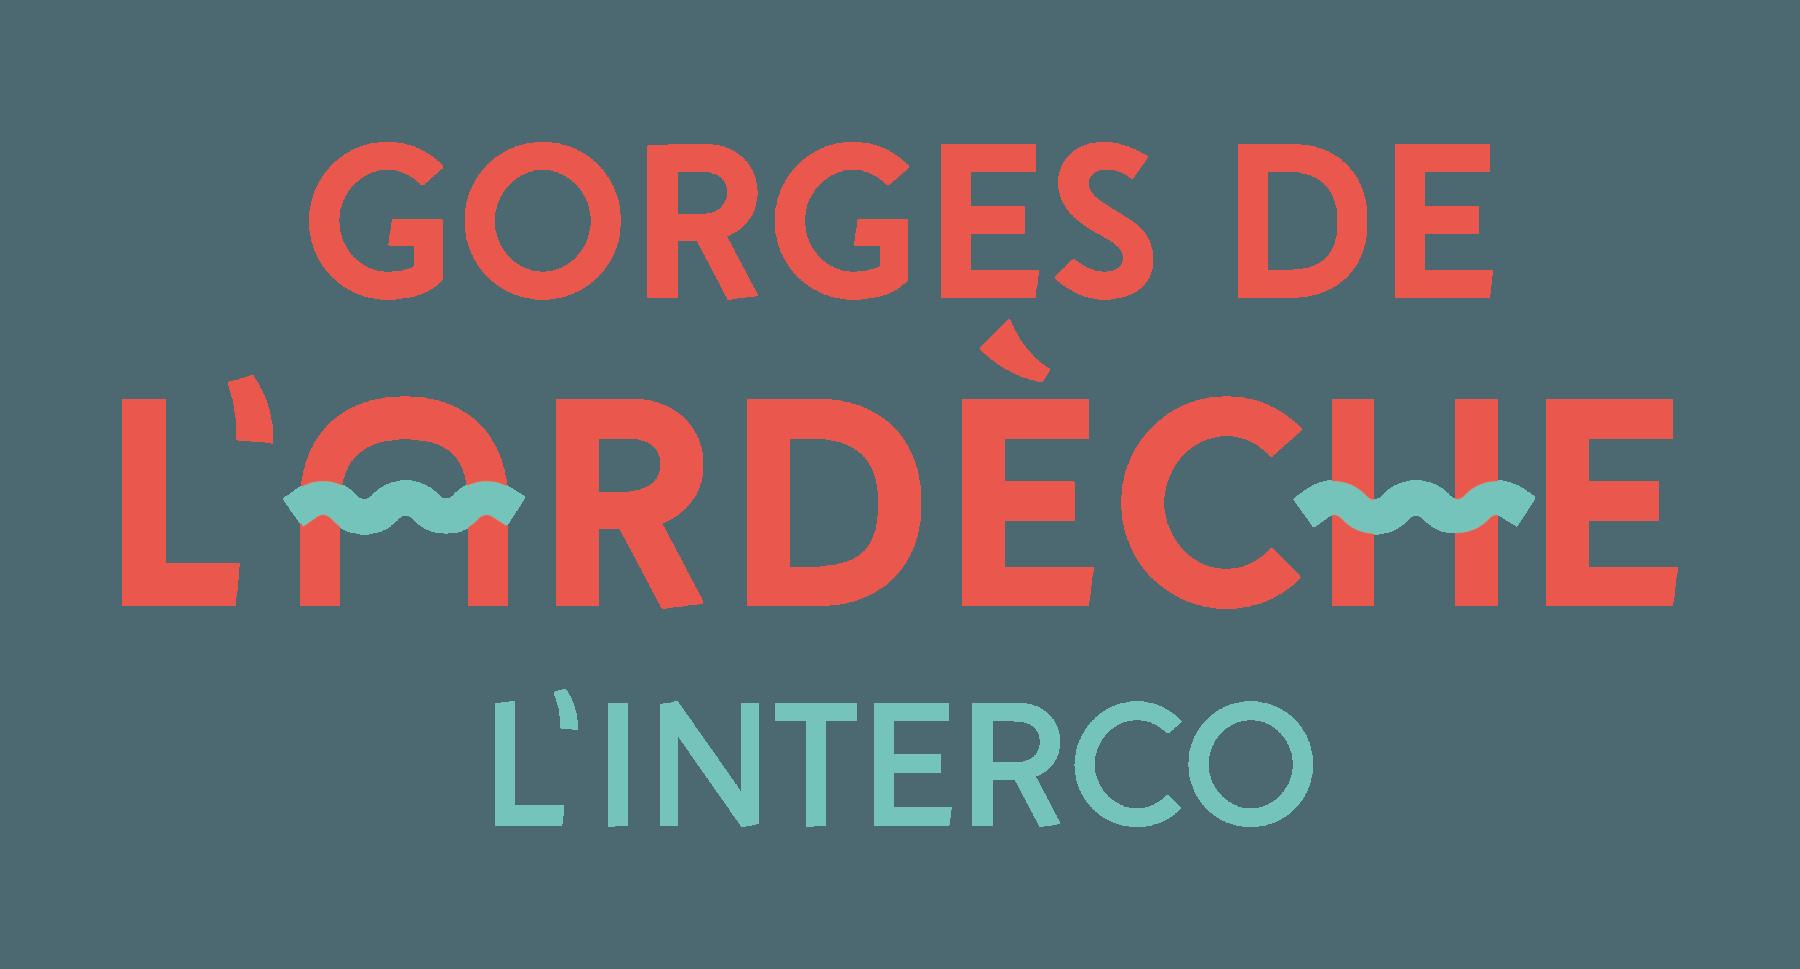 CC-Gorges-Ardeche-Logotype